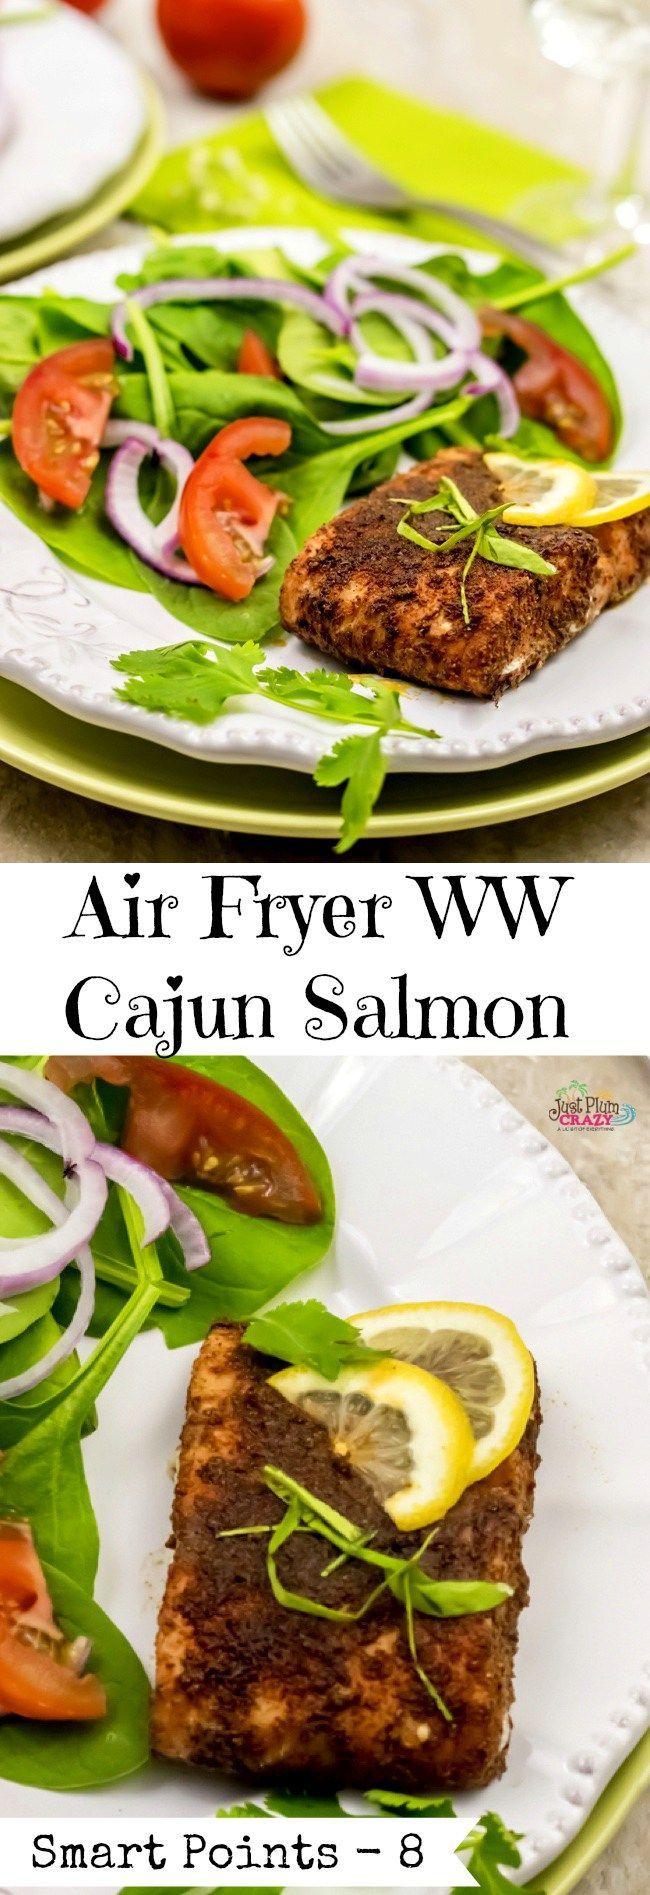 Air Fryer Salmon Cajun Style Recipe Salmon Recipes